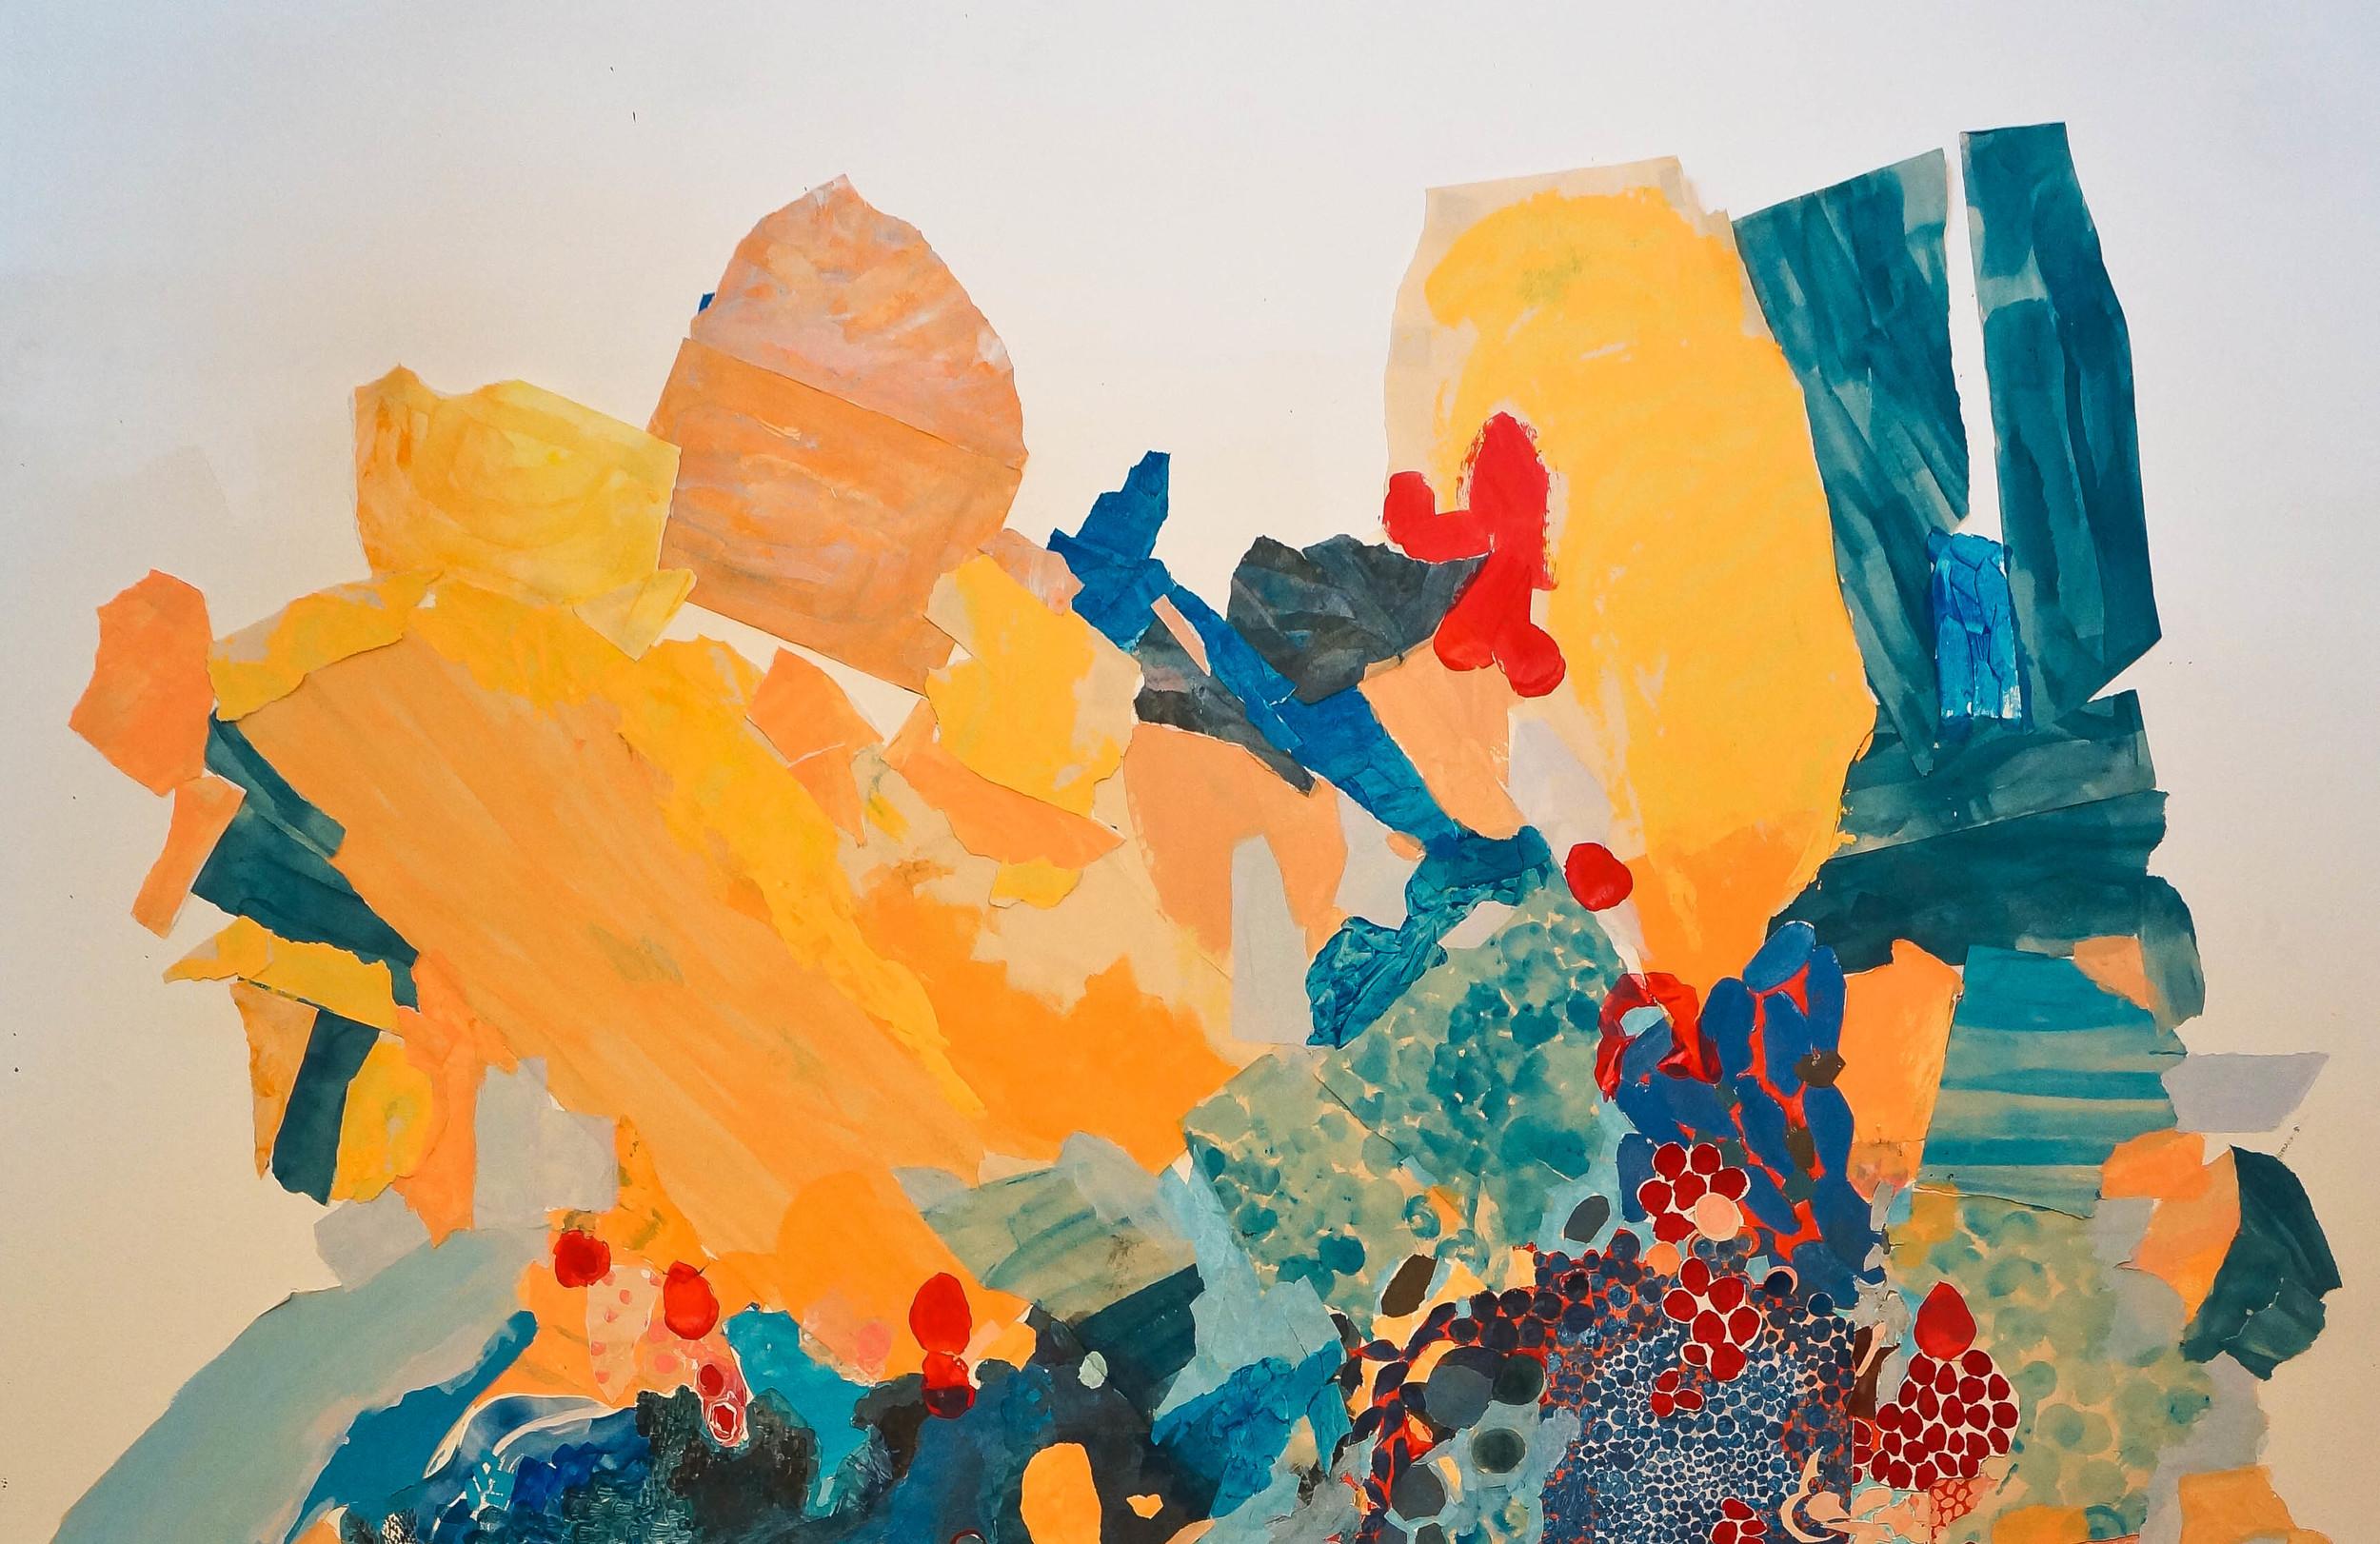 Acrylic paint, cut paper,cut canvas,newsprint,painter's tape, masking tape 2014